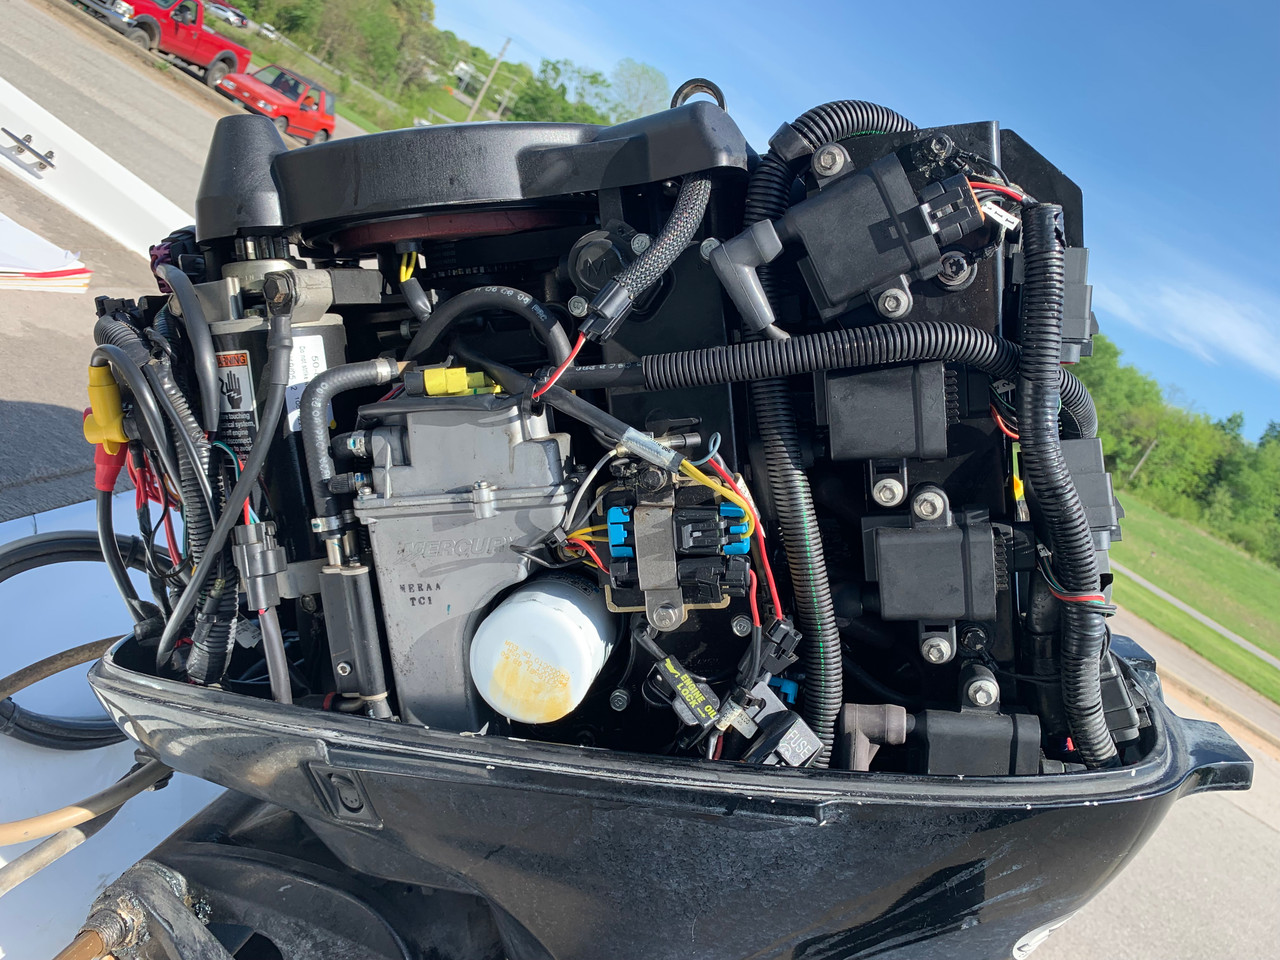 2006 Tracker Nitro 640LX 16' Fiberglass Bass Boat with Mercury 60 HP Outboard Motor and Trailer